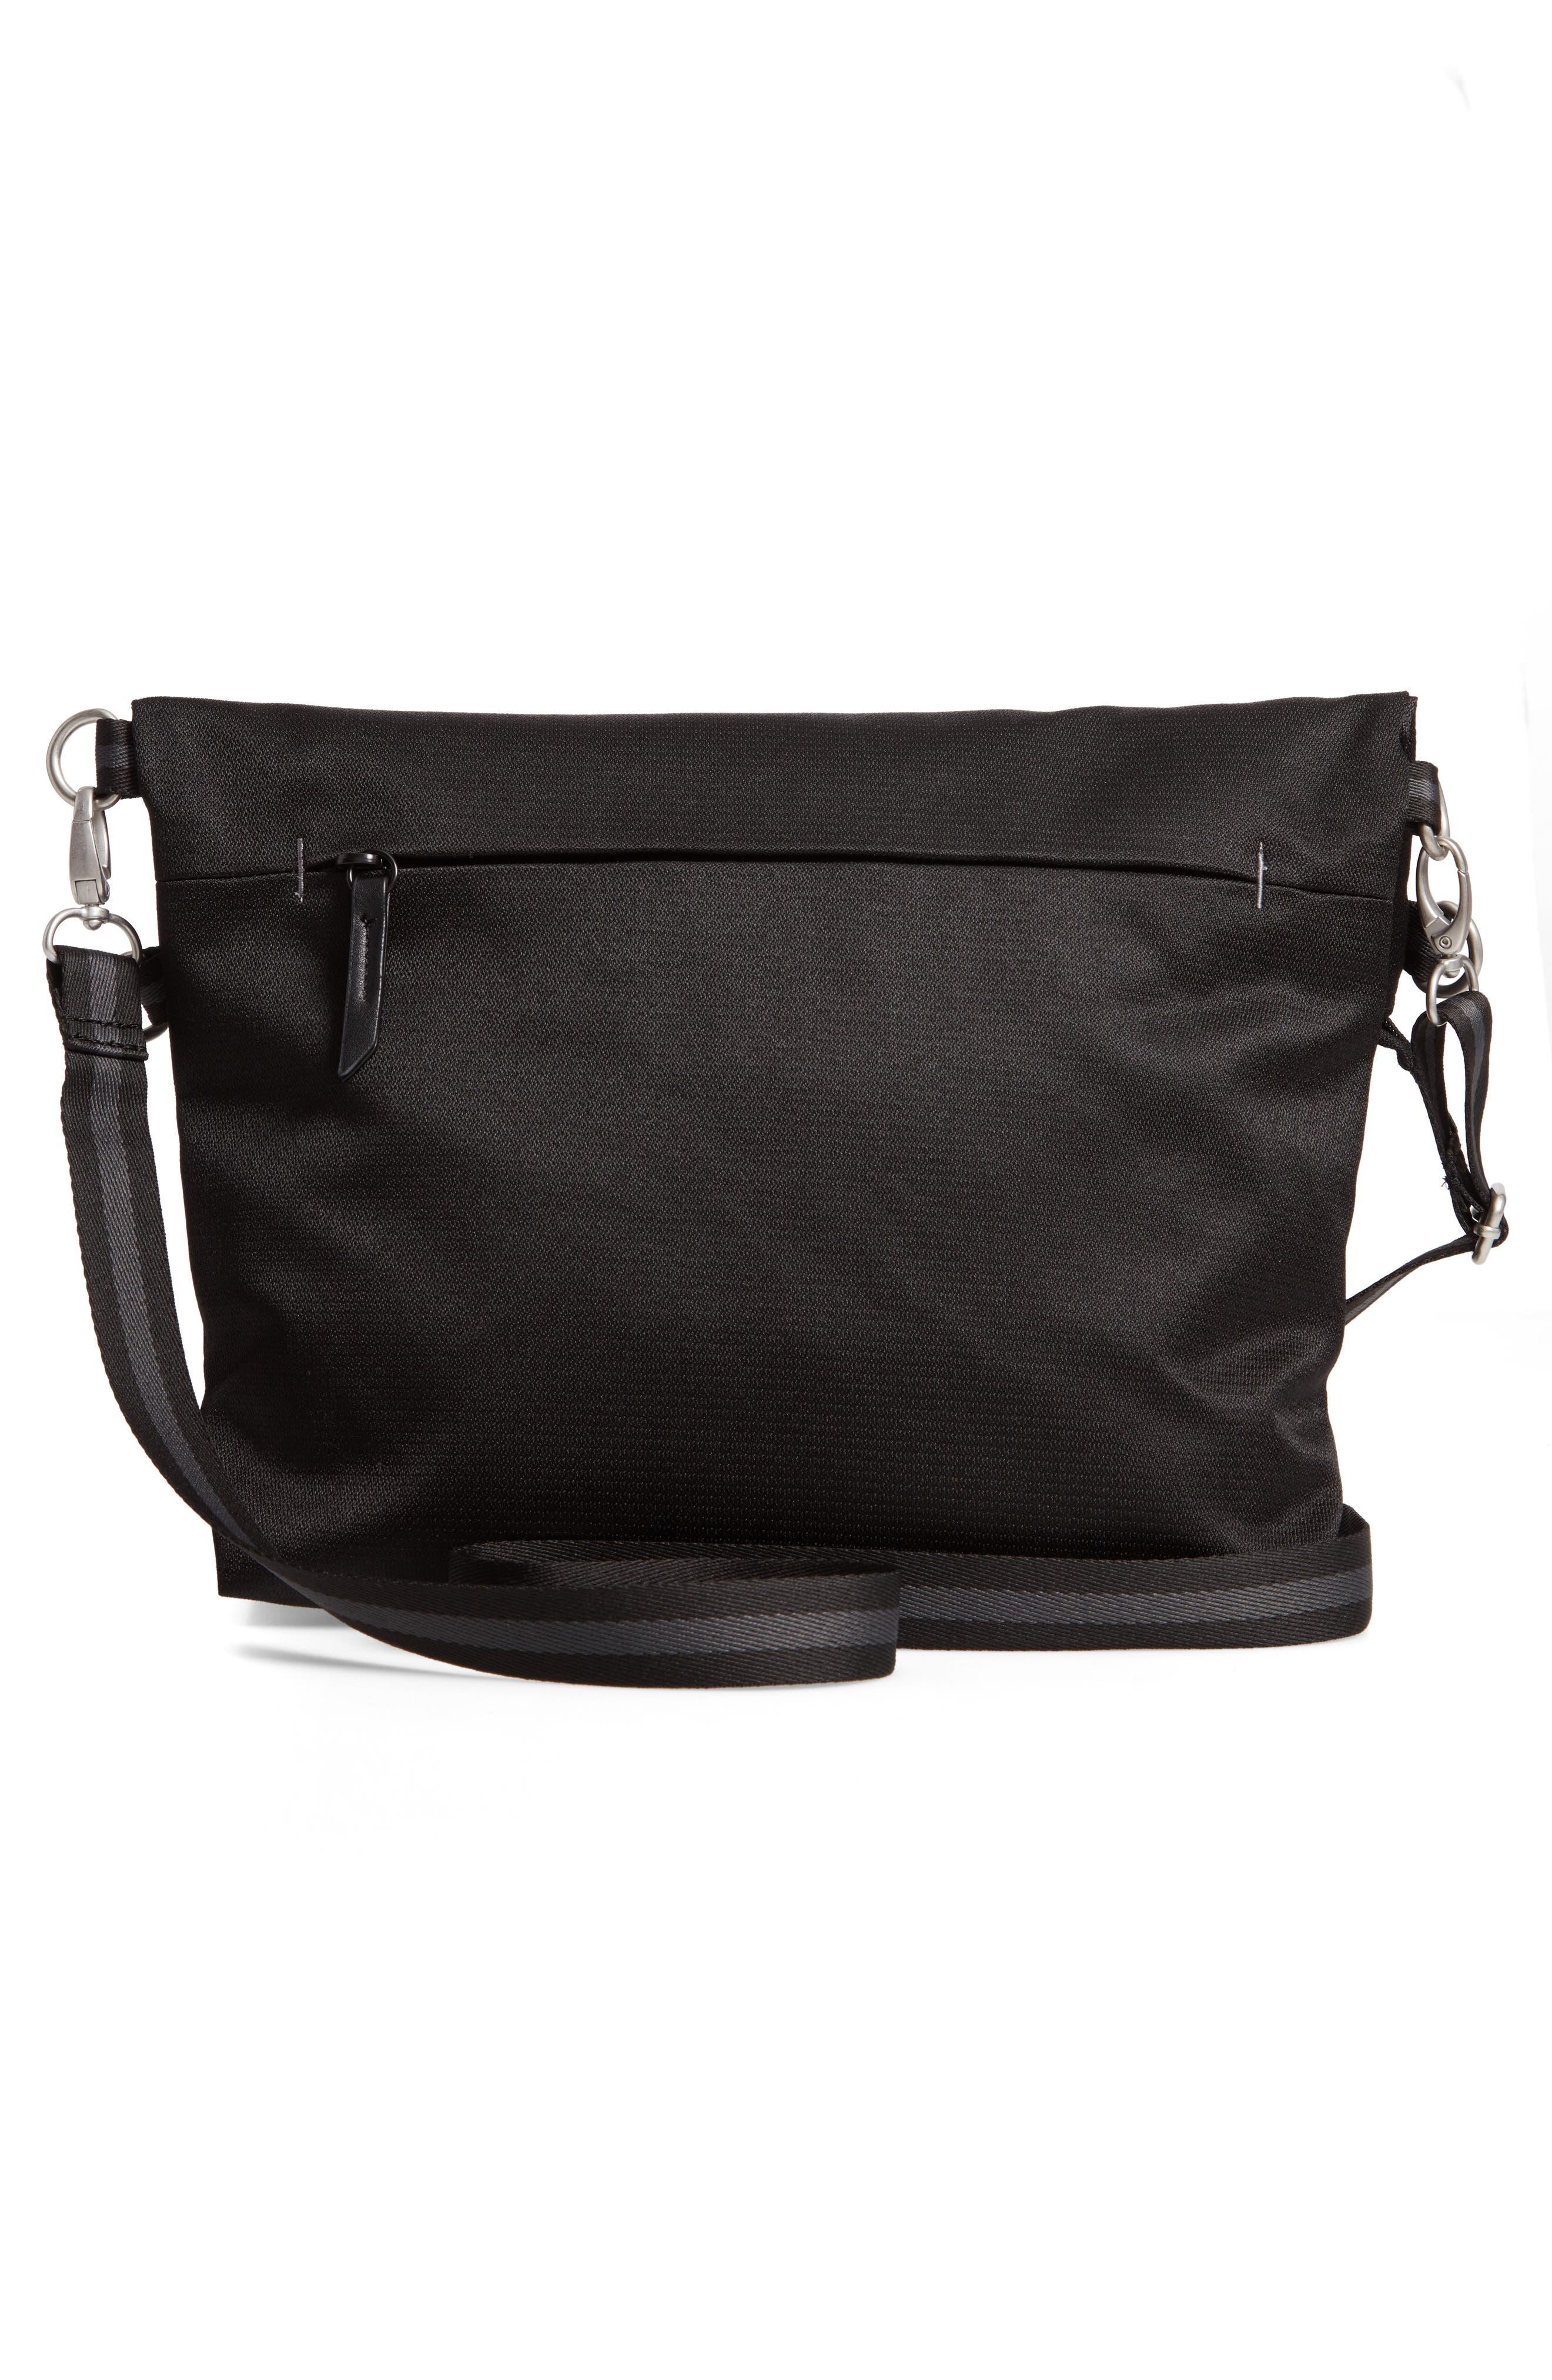 Vale RFID Crossbody Bag,                             Alternate thumbnail 4, color,                             BLACK/ BLACK